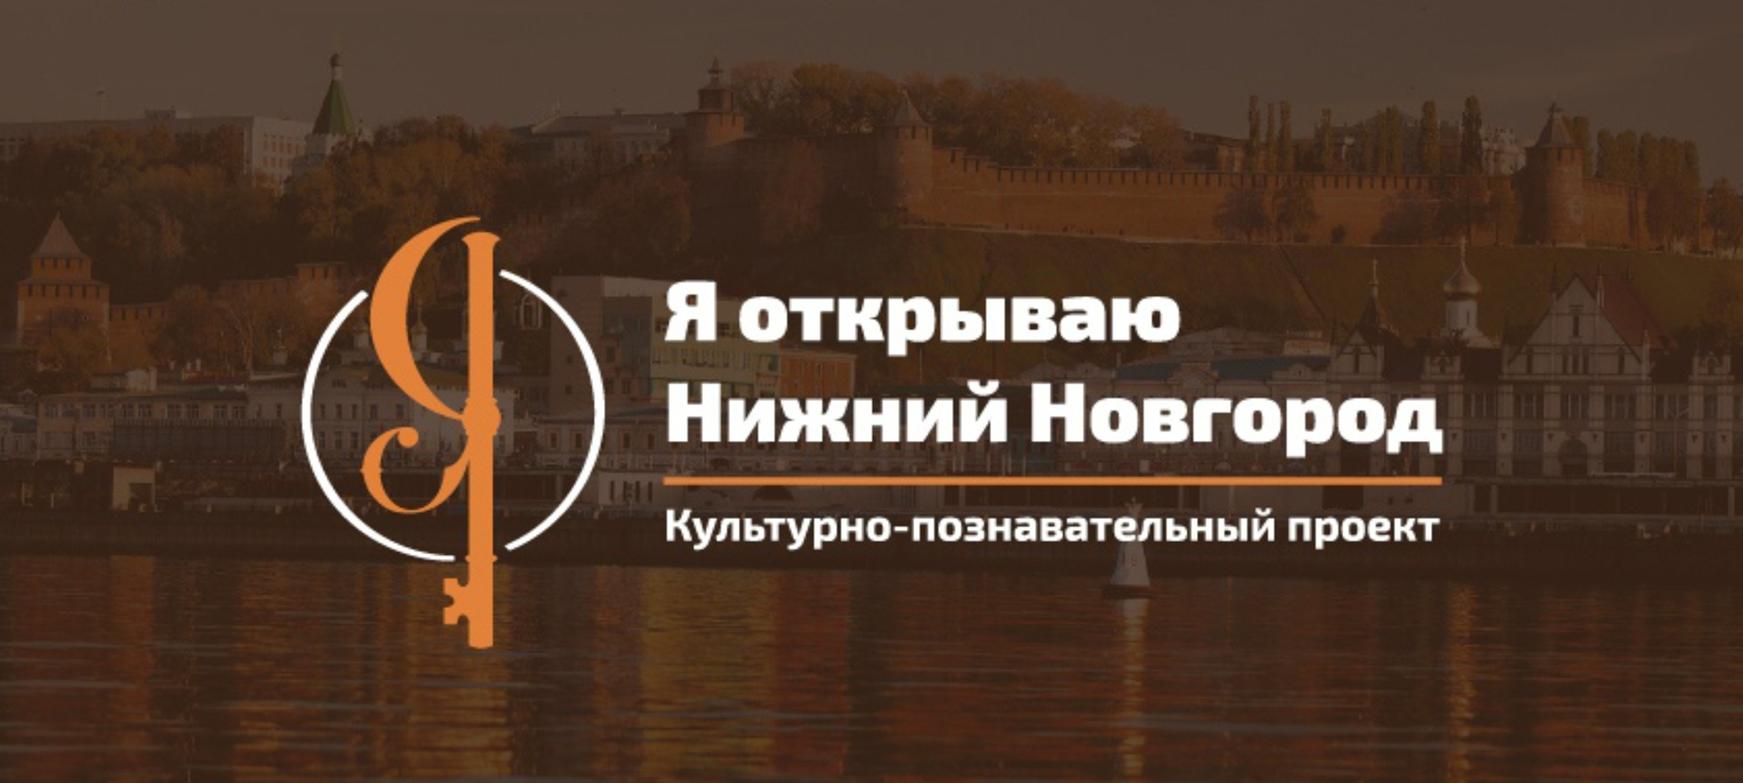 Я открываю Нижний Новгород